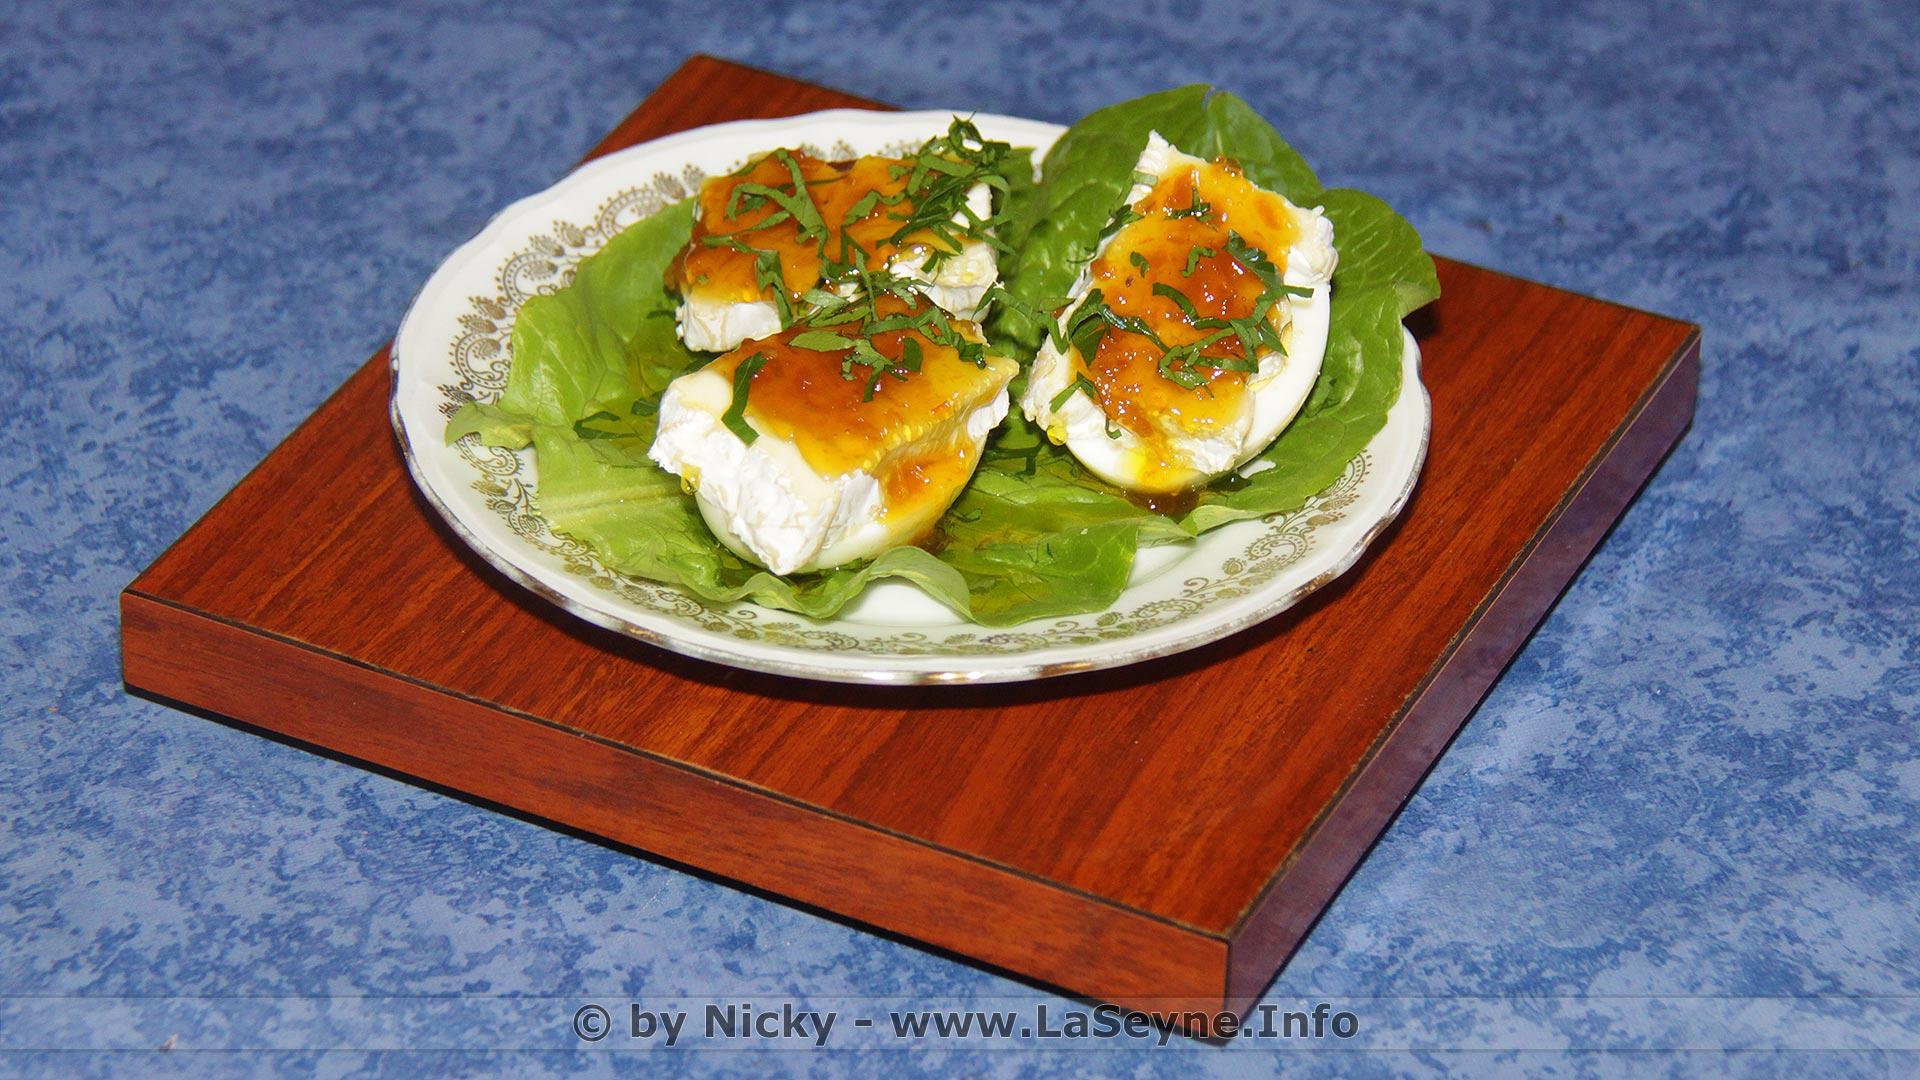 Oeuf dur sur Salade romaine avec Marmelade de Citron sur Camembert cru